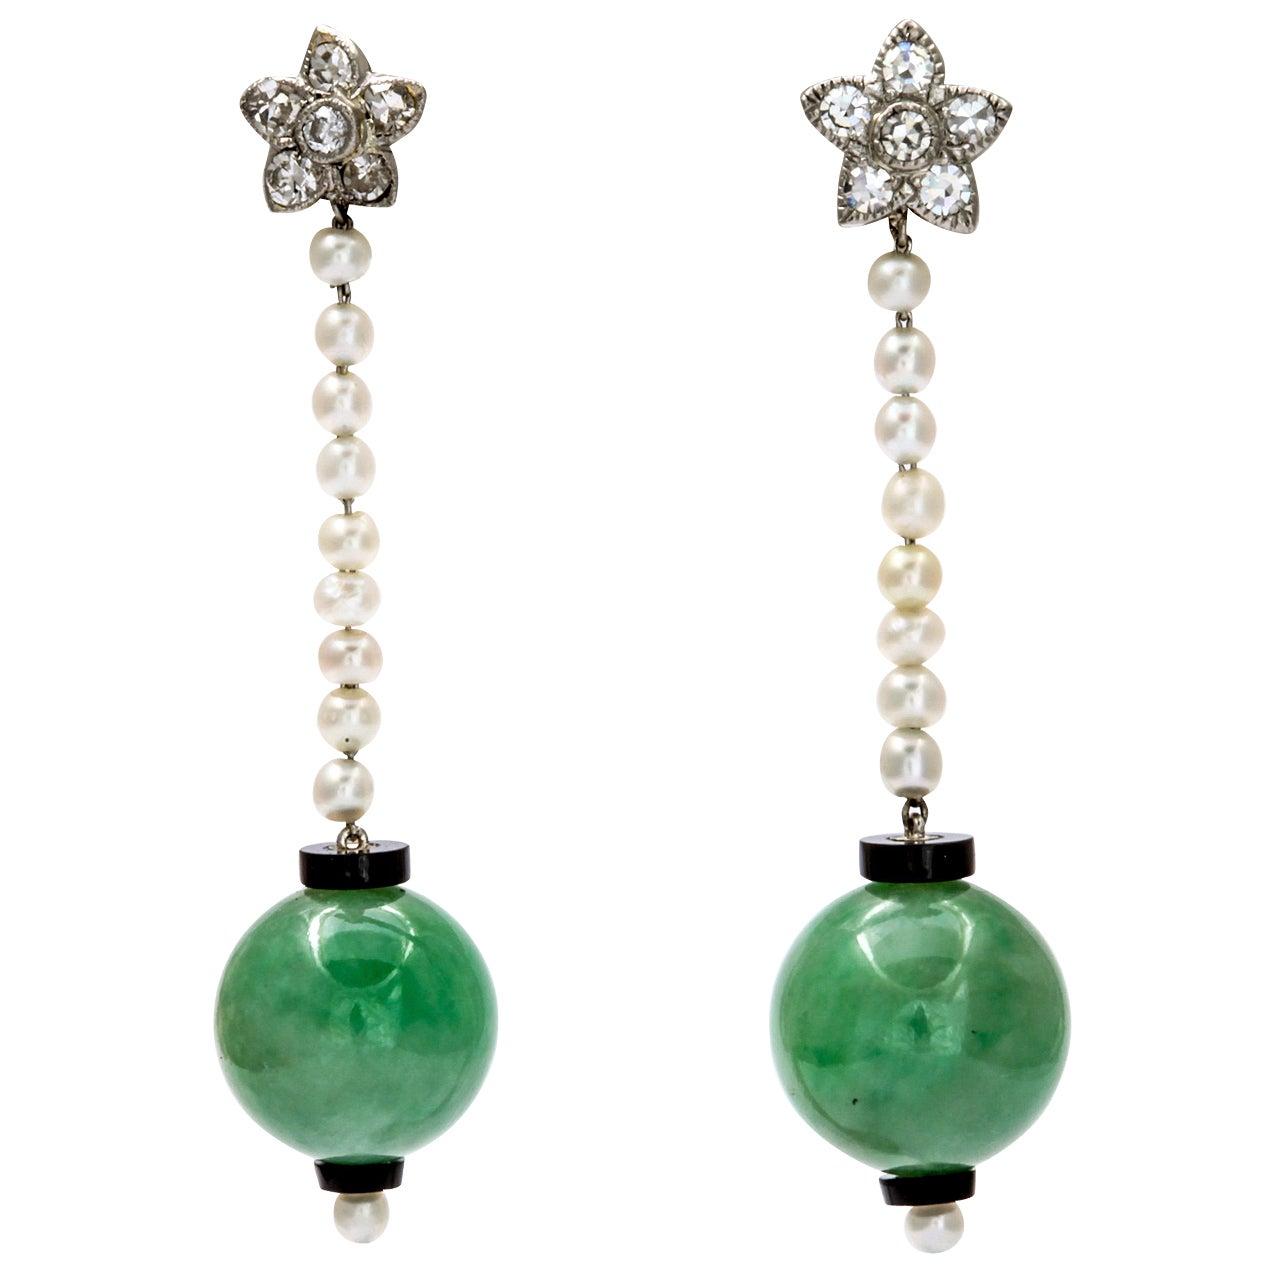 Voluptuous Art Deco Jade Earrings